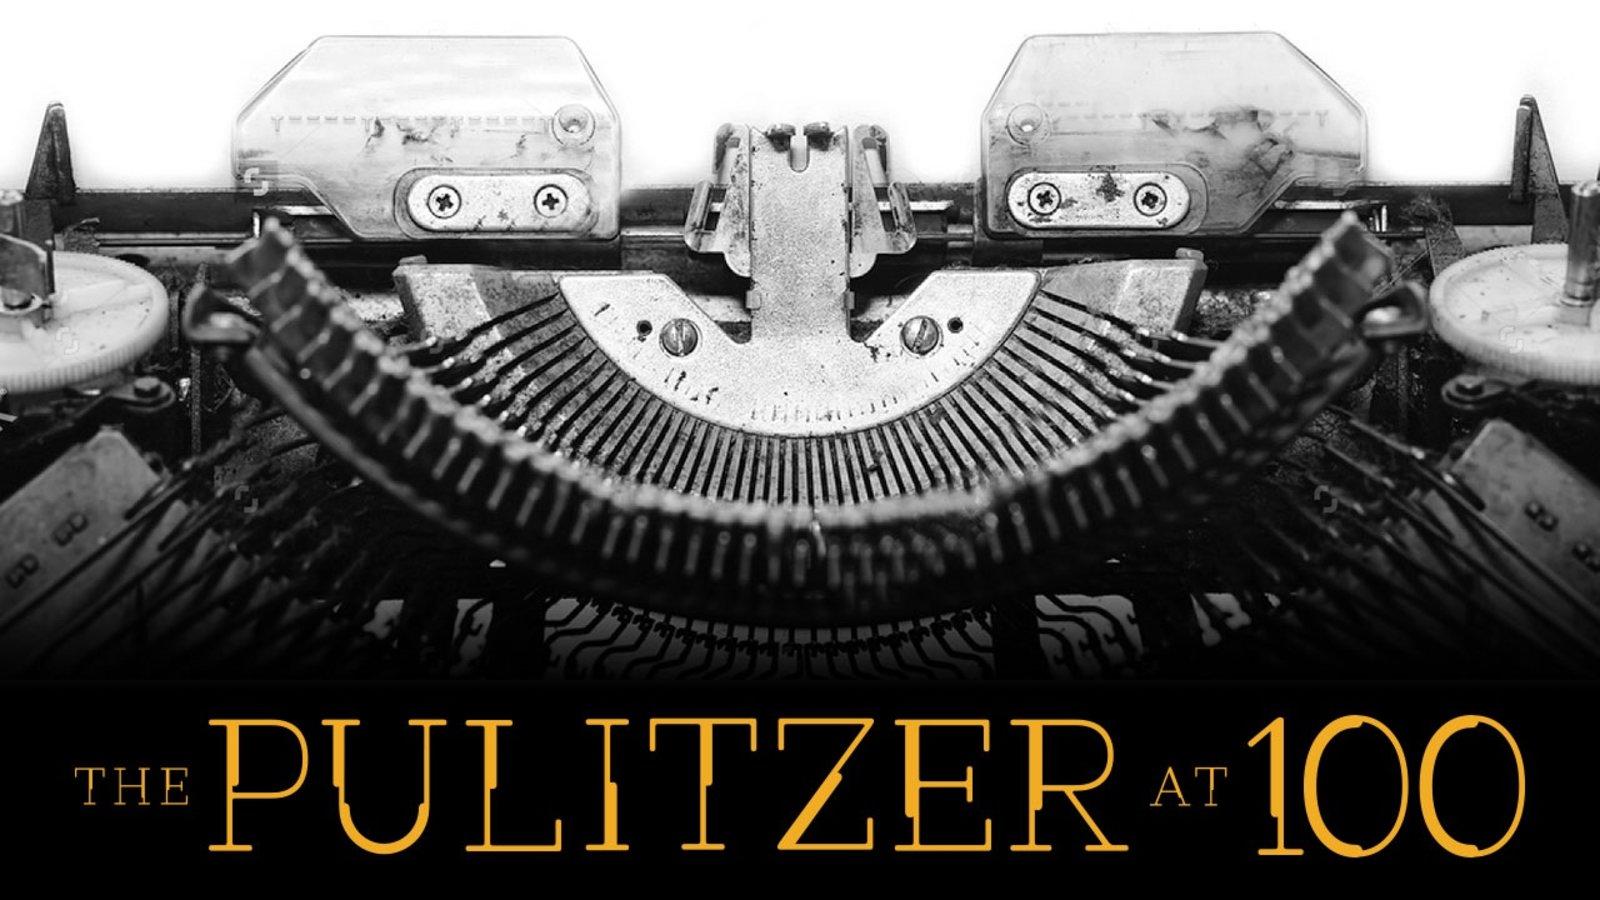 The Pulitzer at 100 - Celebrating the Pulitzer's Centenary